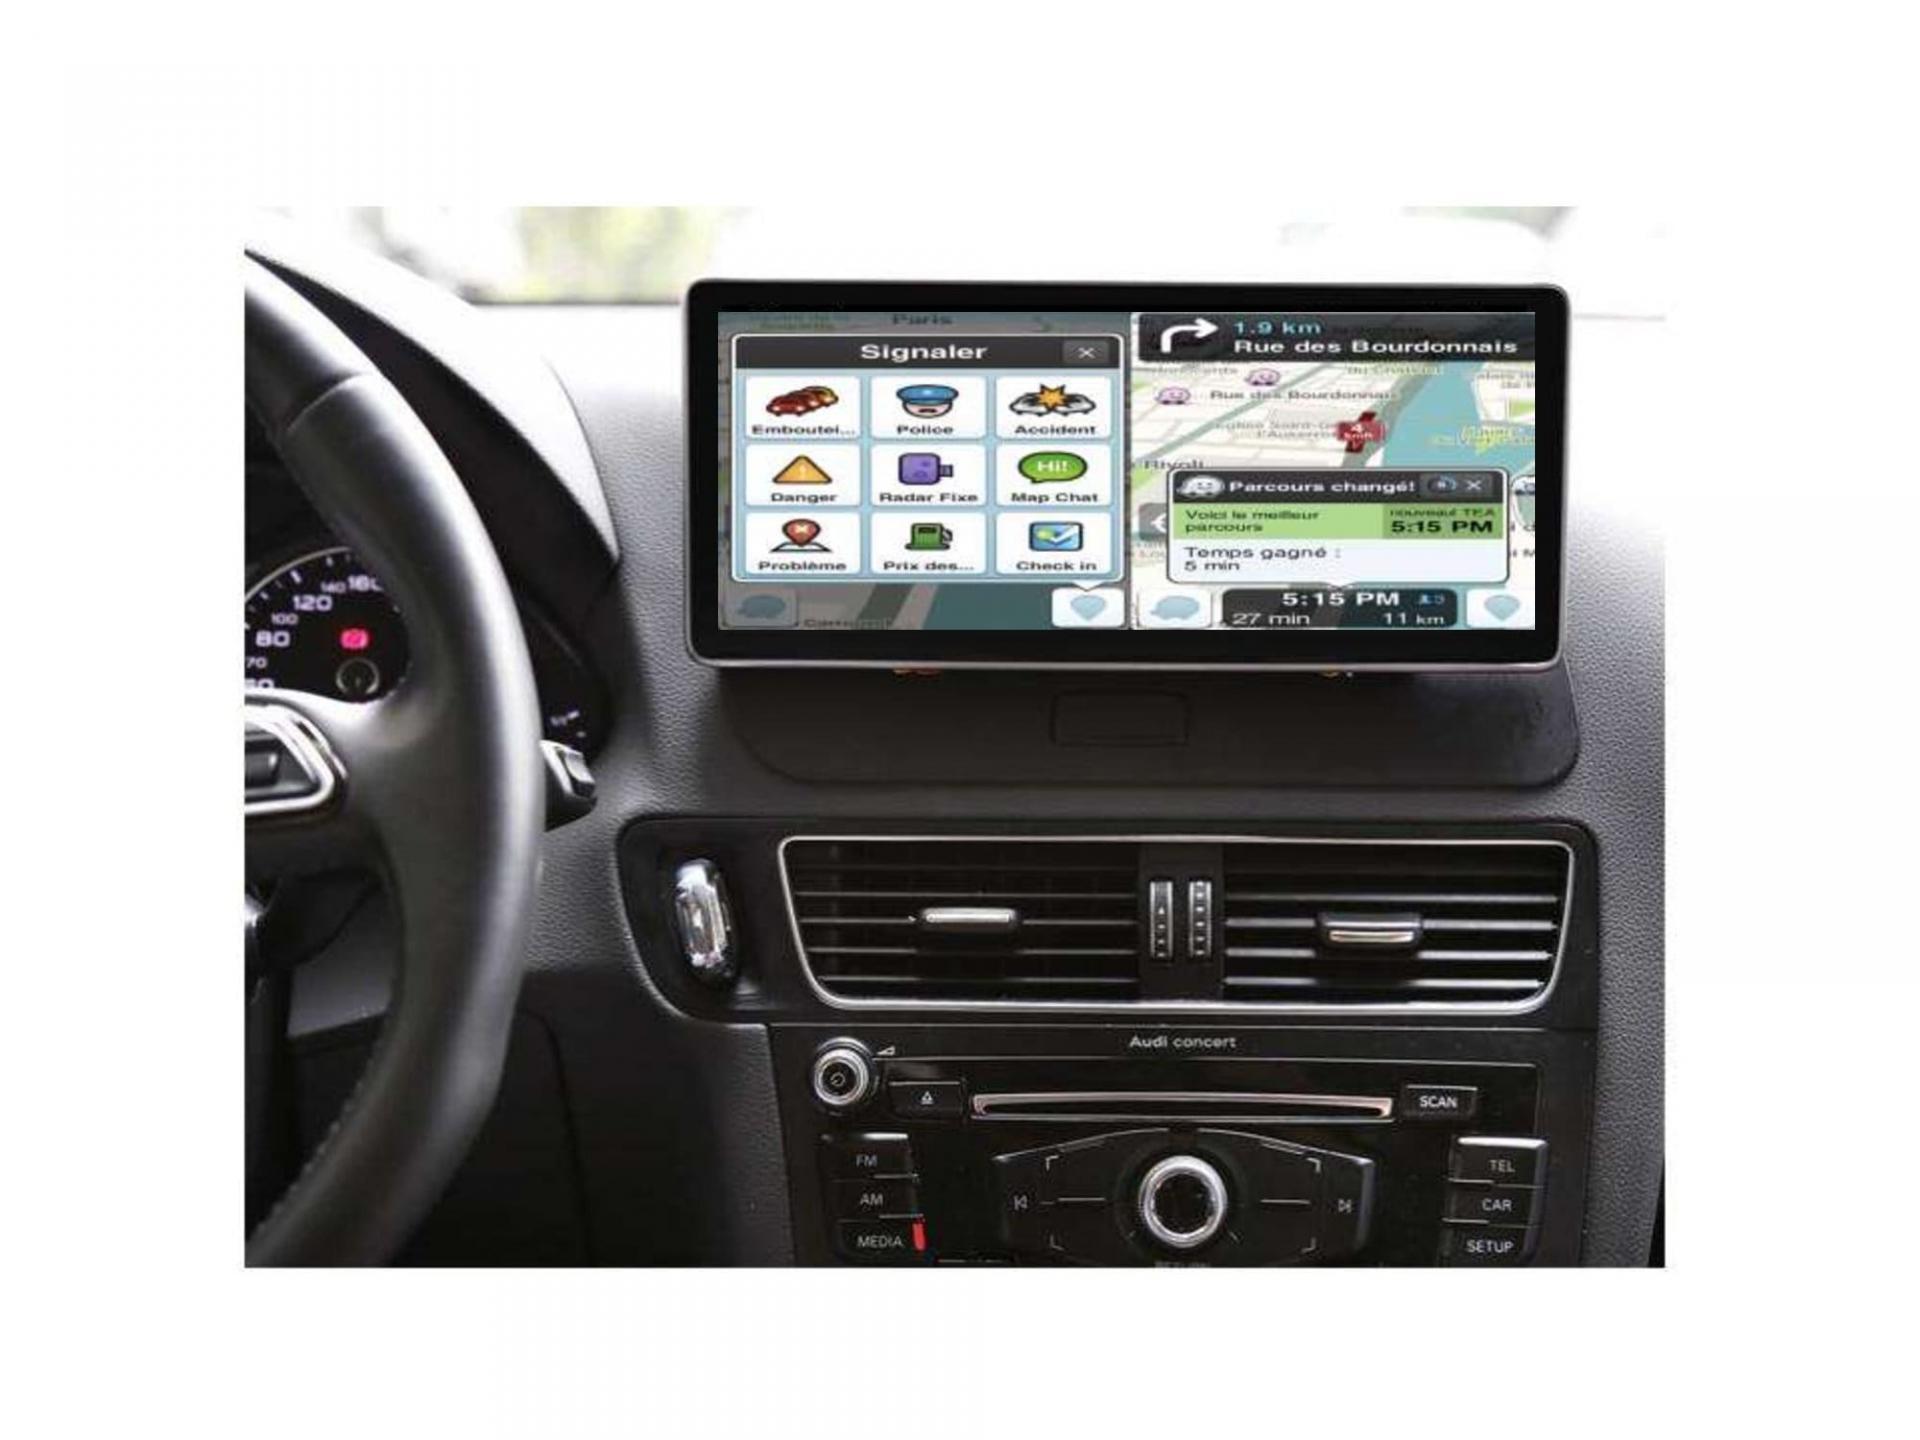 Audi a4 a5 a6 q7 q5 q3 autoradio gps carplay android auto gps bluetooth 21